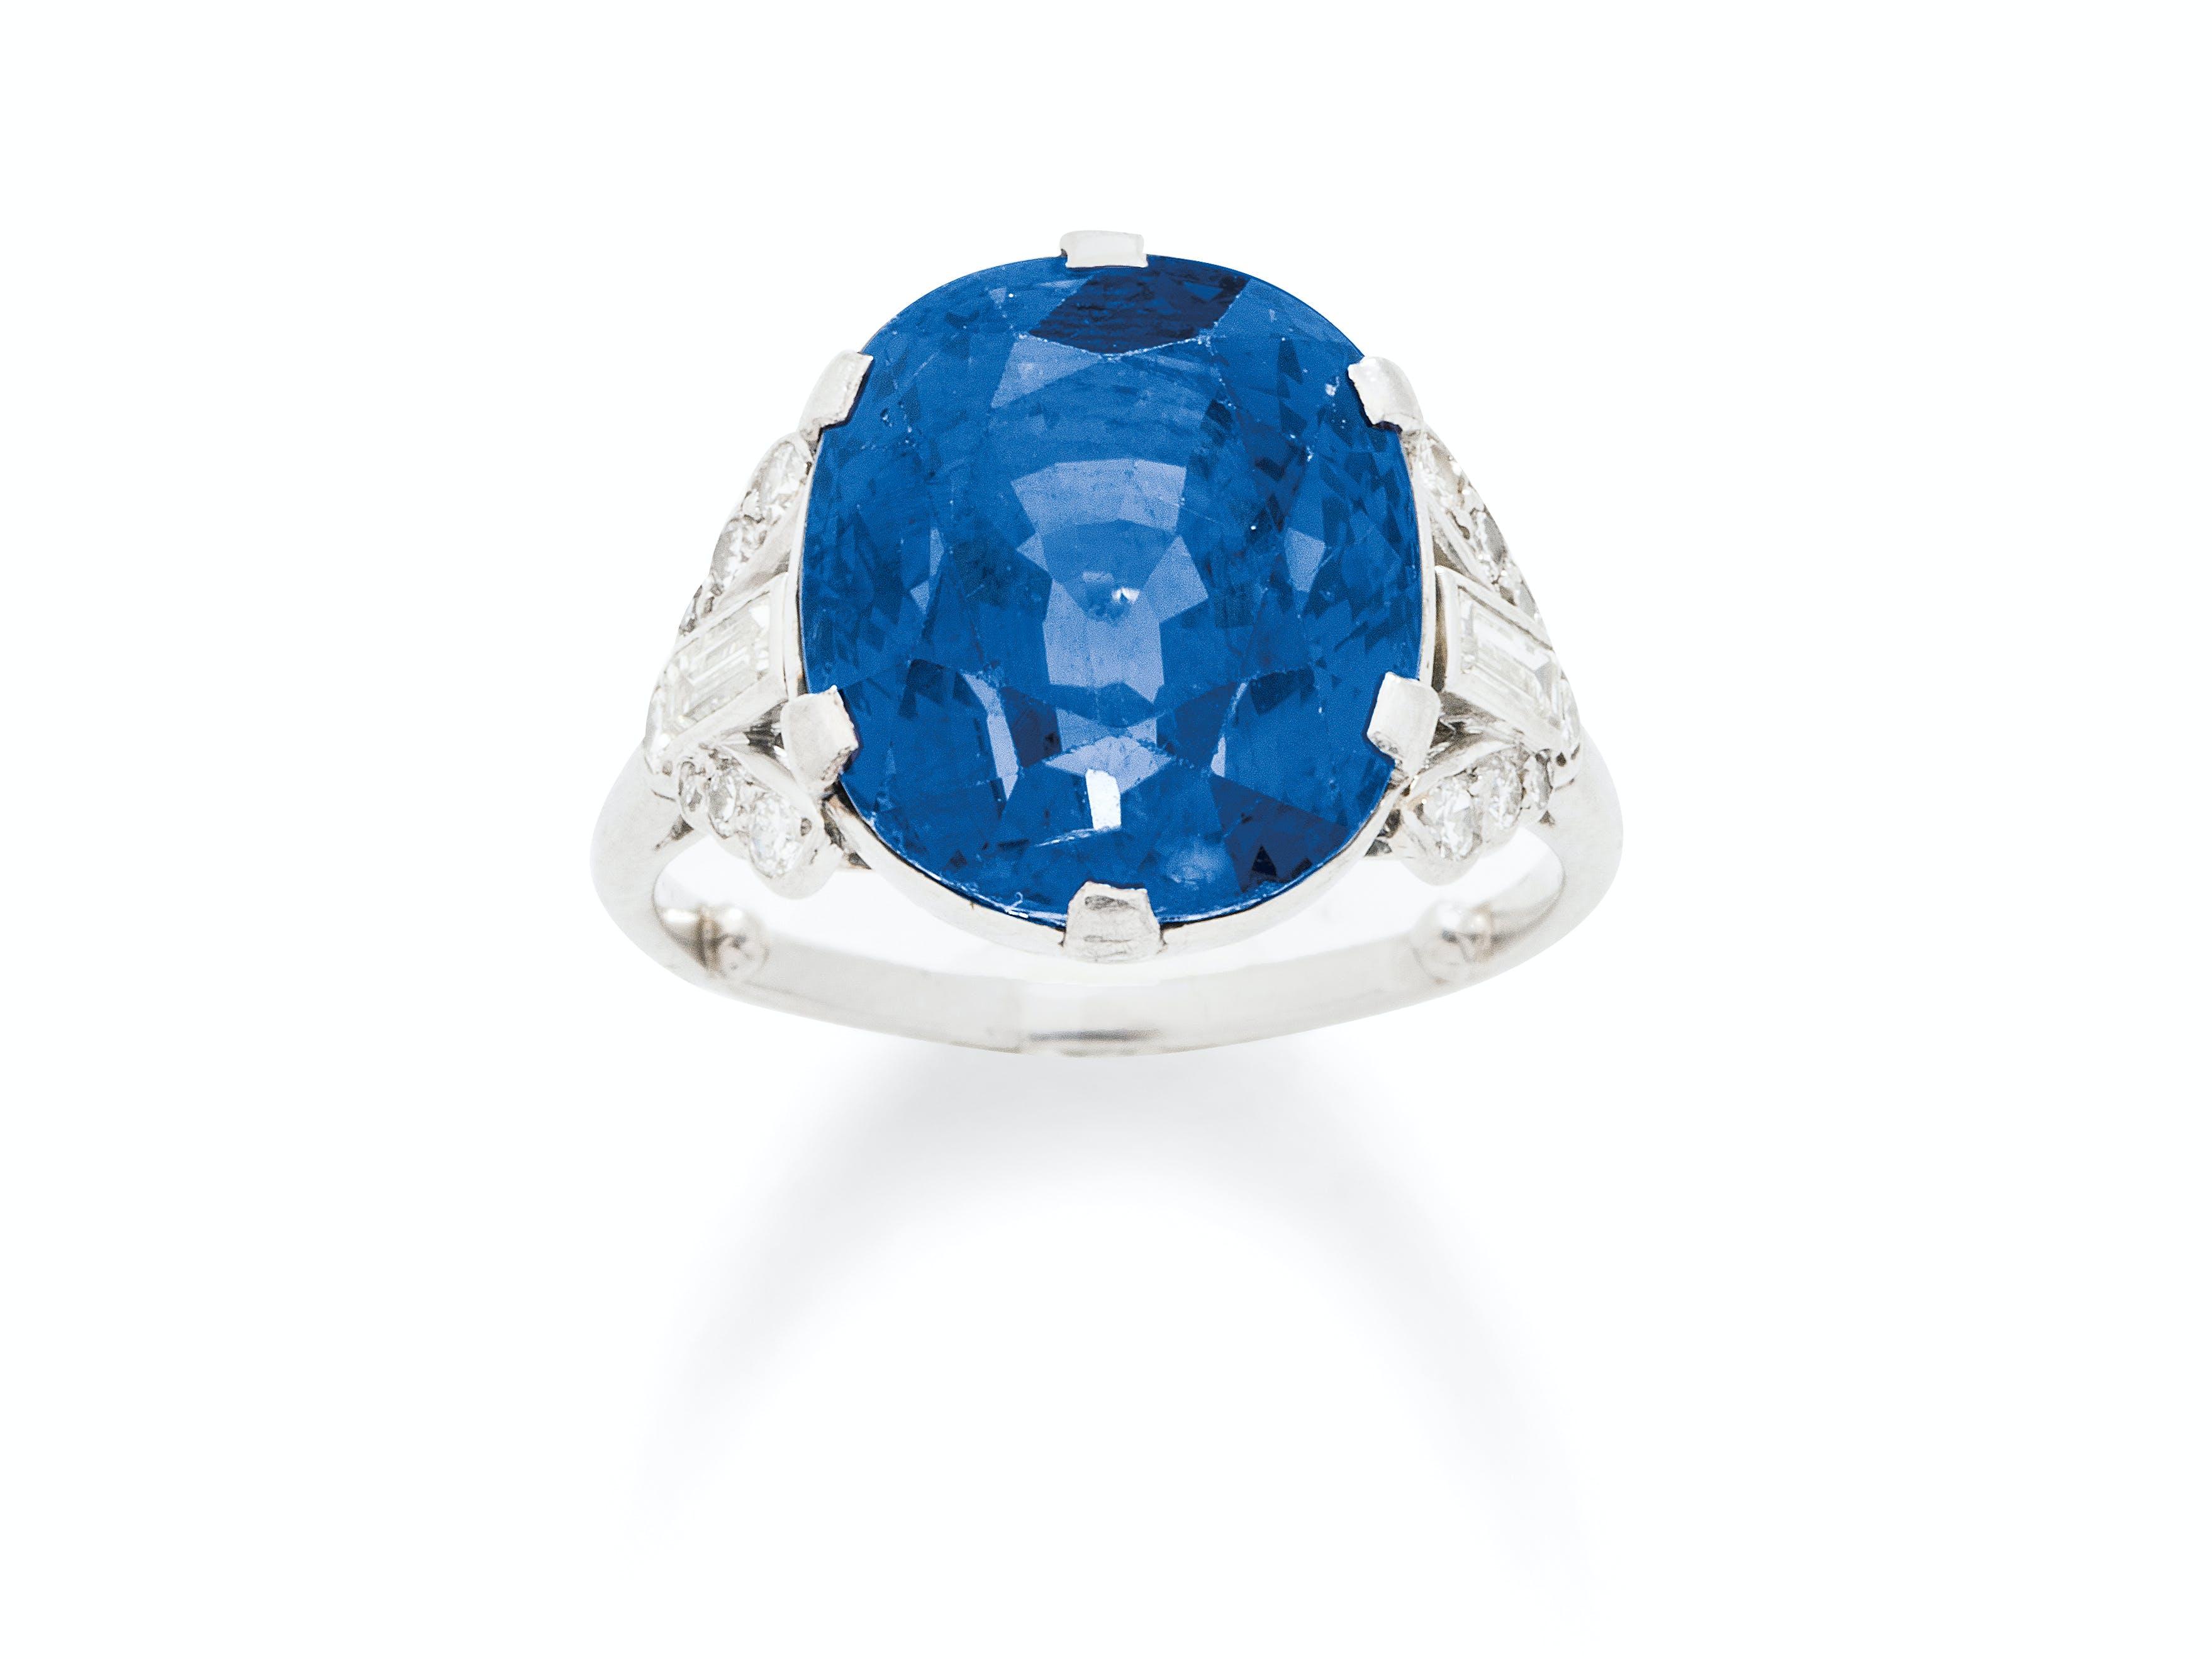 A Very Fine Art Deco Sapphire, Diamond and Platinum Ring, circa 1930